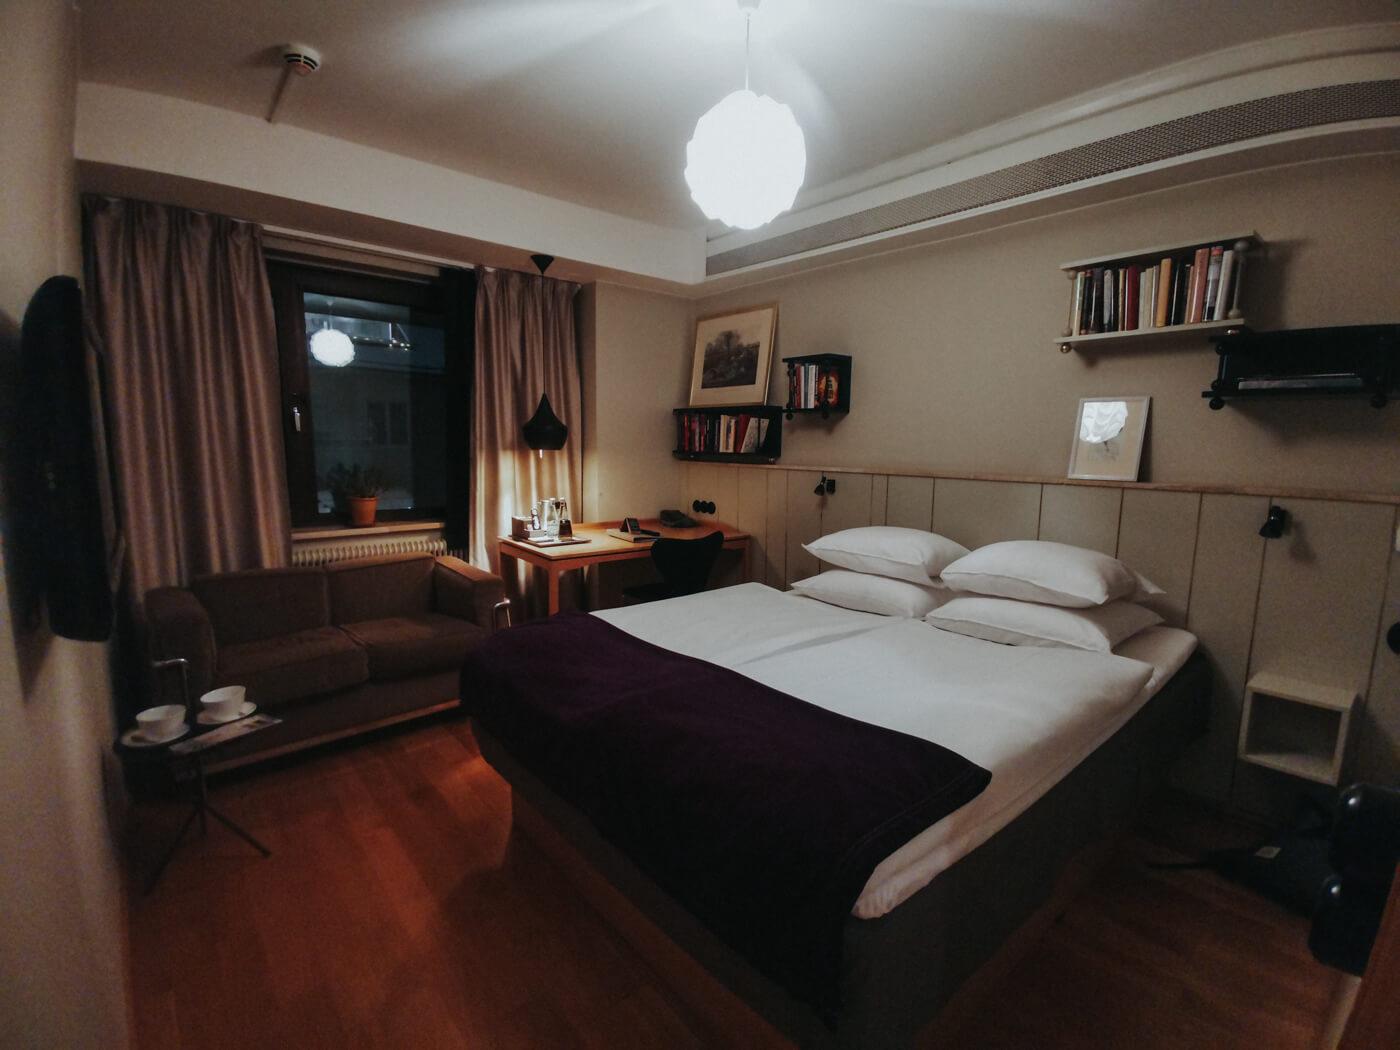 Mornington Hotel Room